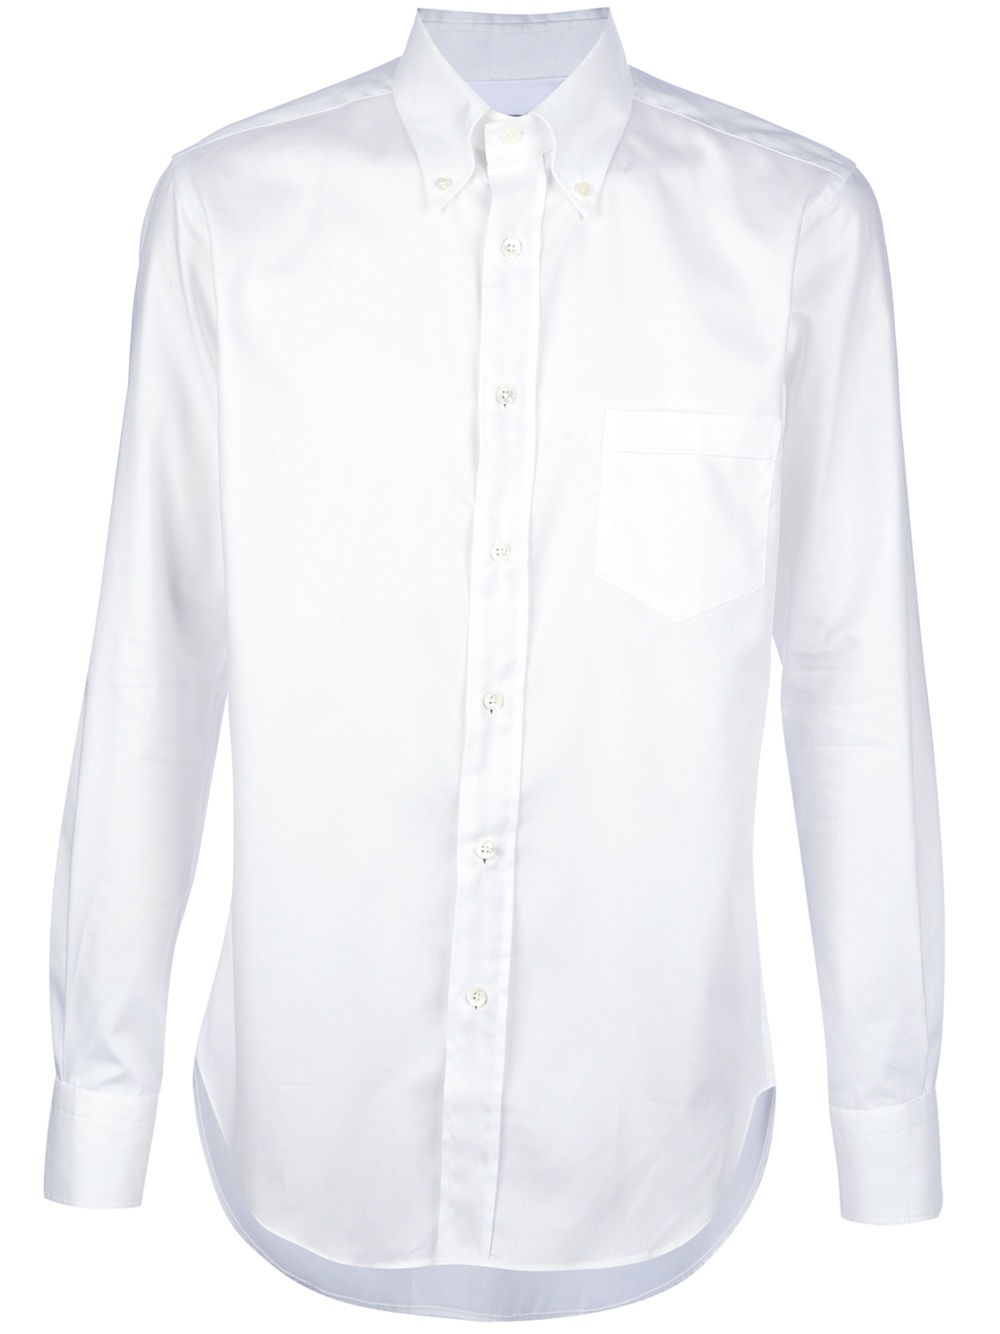 Etro camargue shirt in white for men lyst for Etro men s shirts